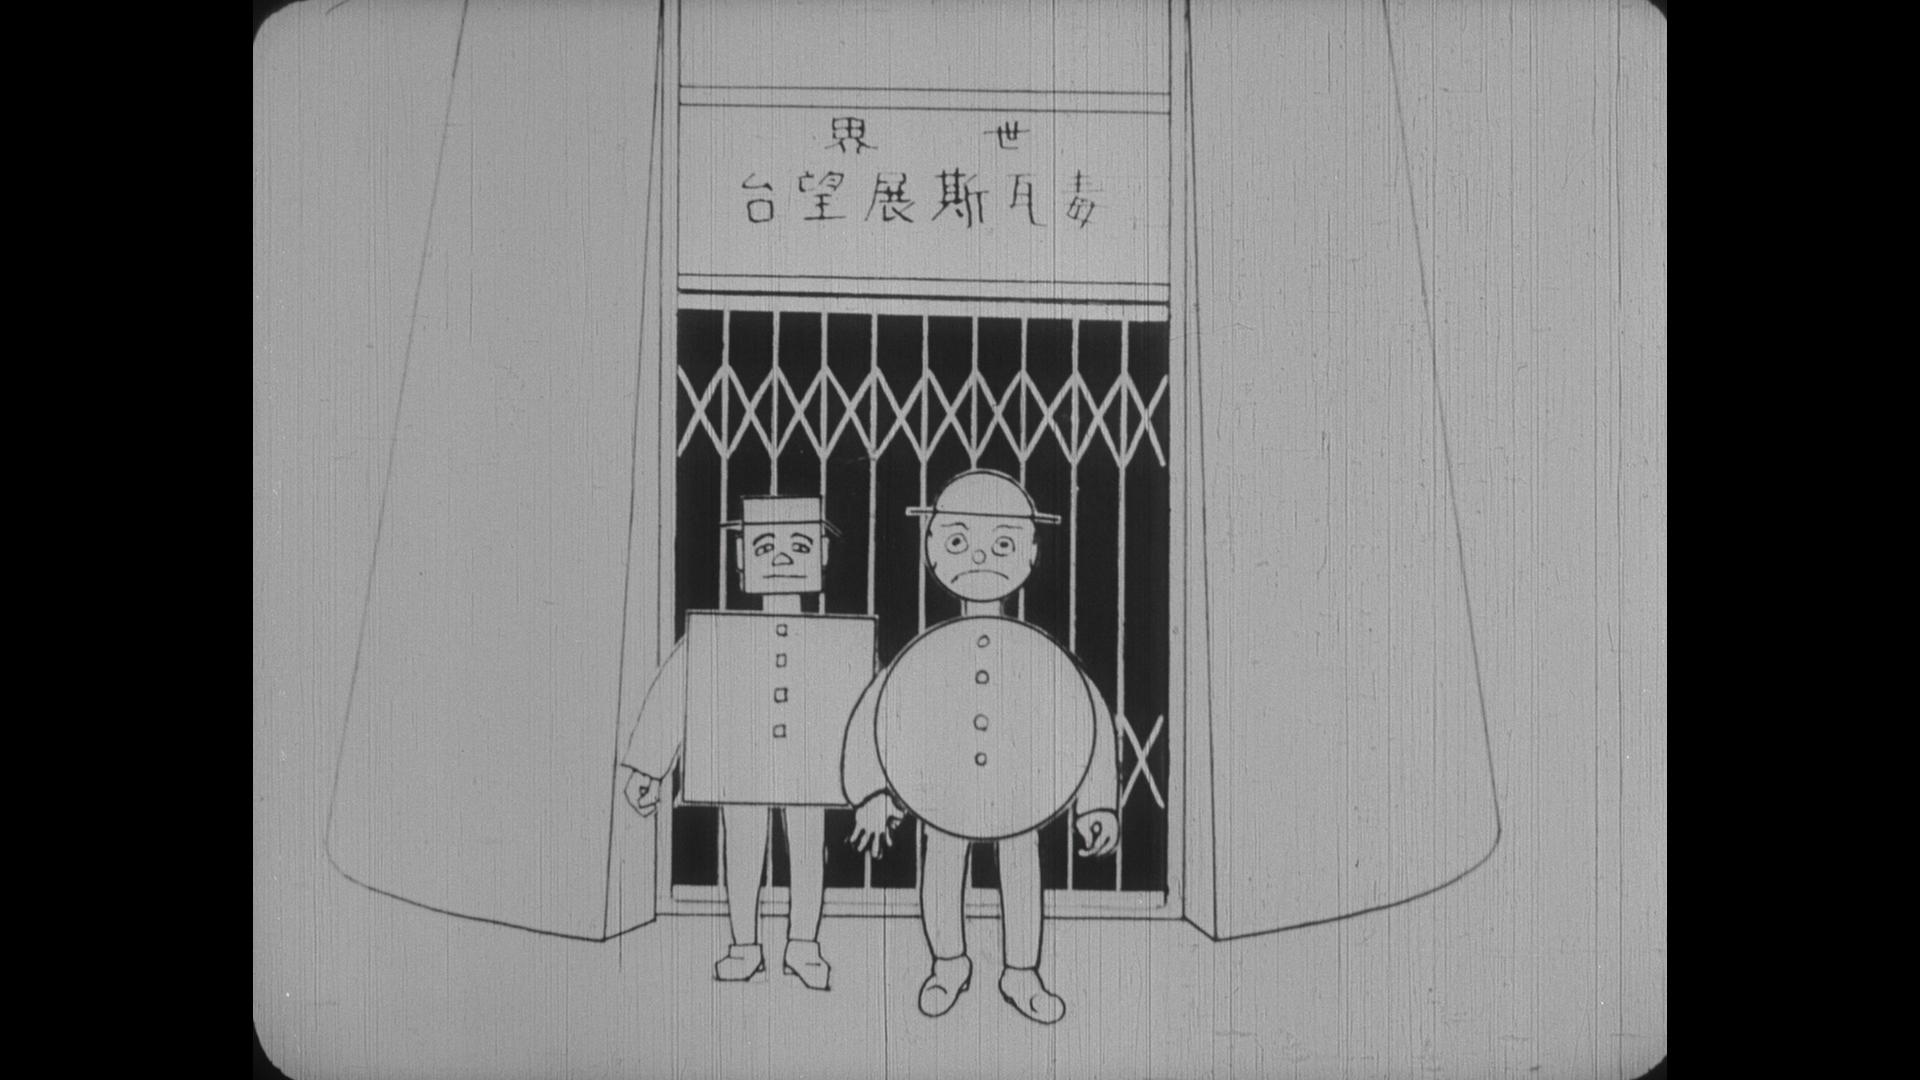 漫画の列国陸軍